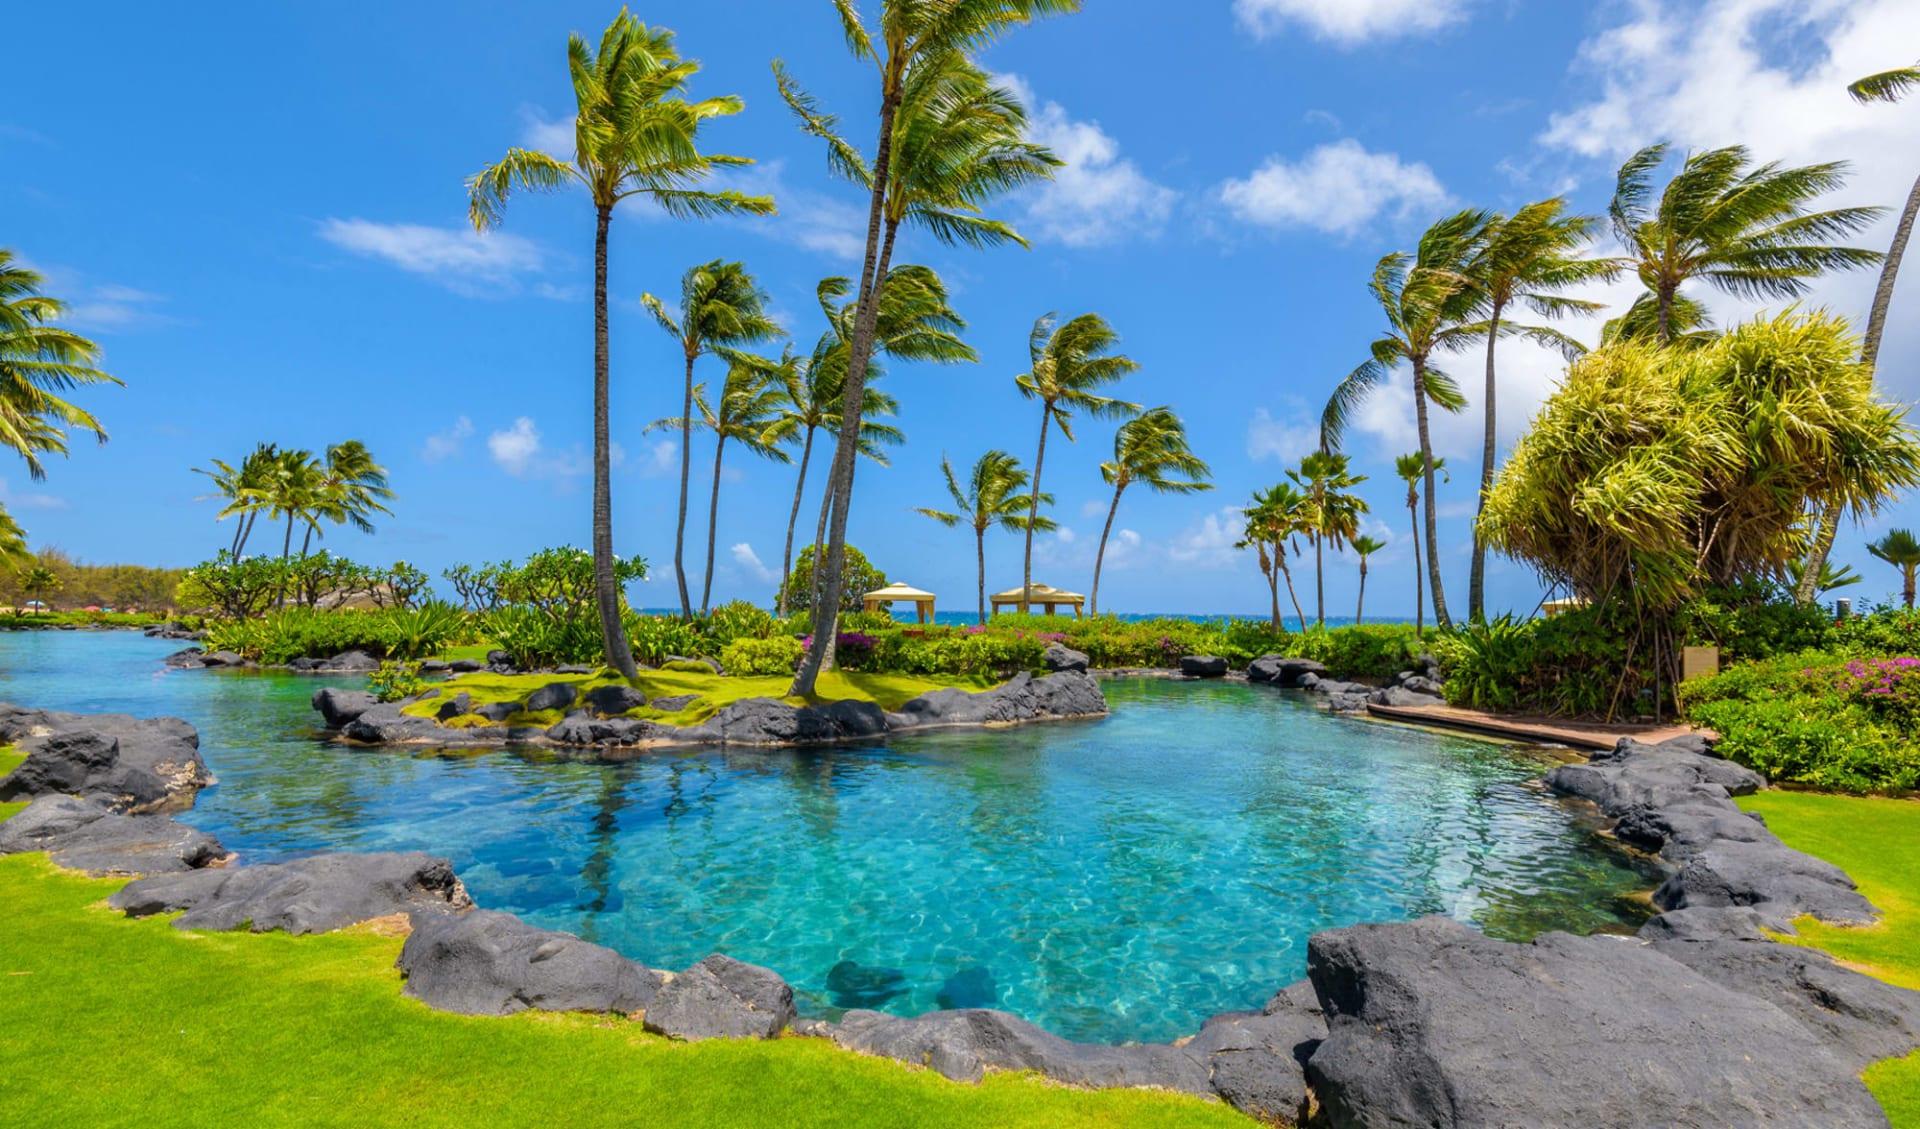 Grand Hyatt Kauai Resort & Spa in Poipu - Kauai:  Exterior_Grand Hyatt Kauai Resort_Lagune_ATI